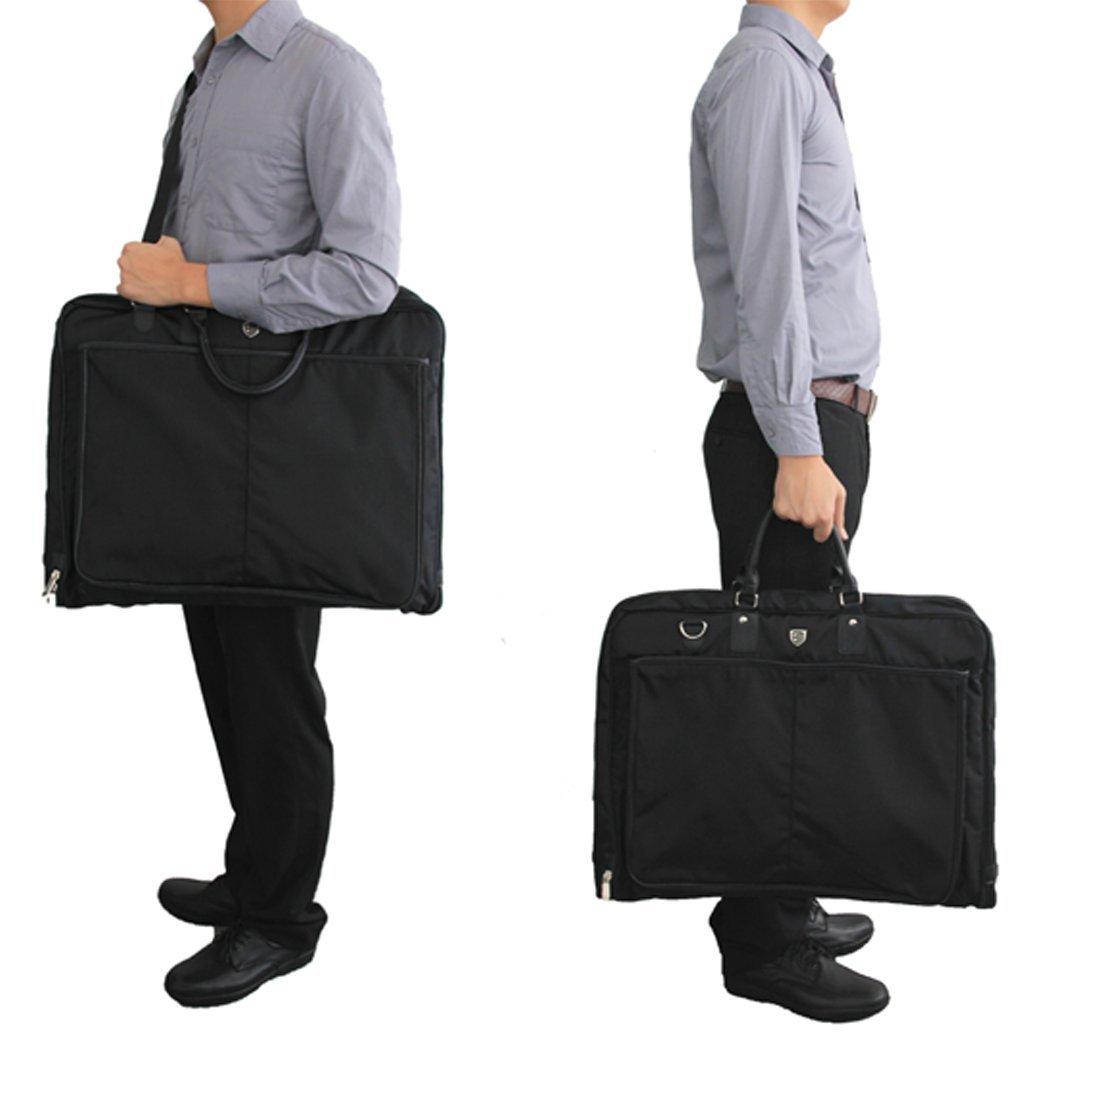 Tongshi Nueva mujeres calientes bolso bandolera peluche bolso bolso de mano cartera